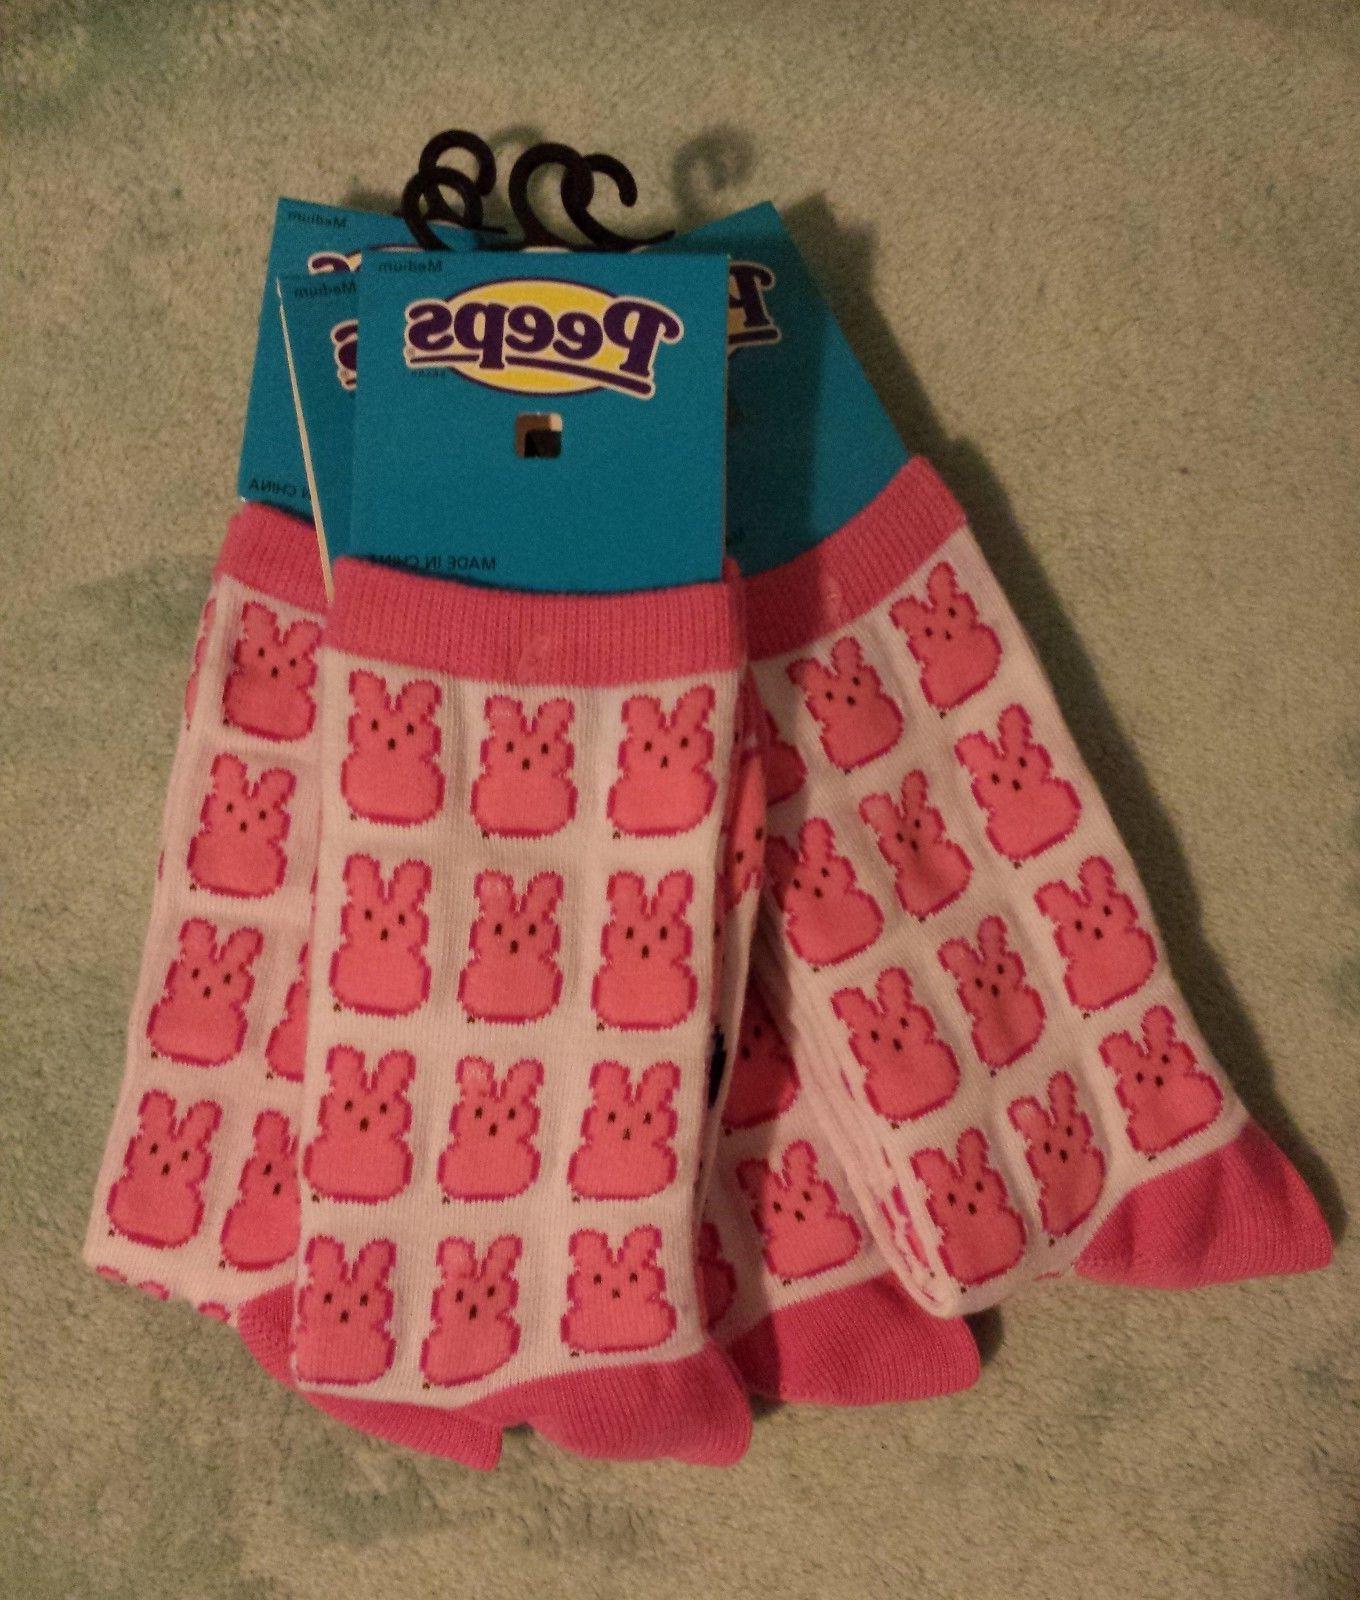 Peeps *Limited Bunny Socks/Liners MEDIUM Women Men